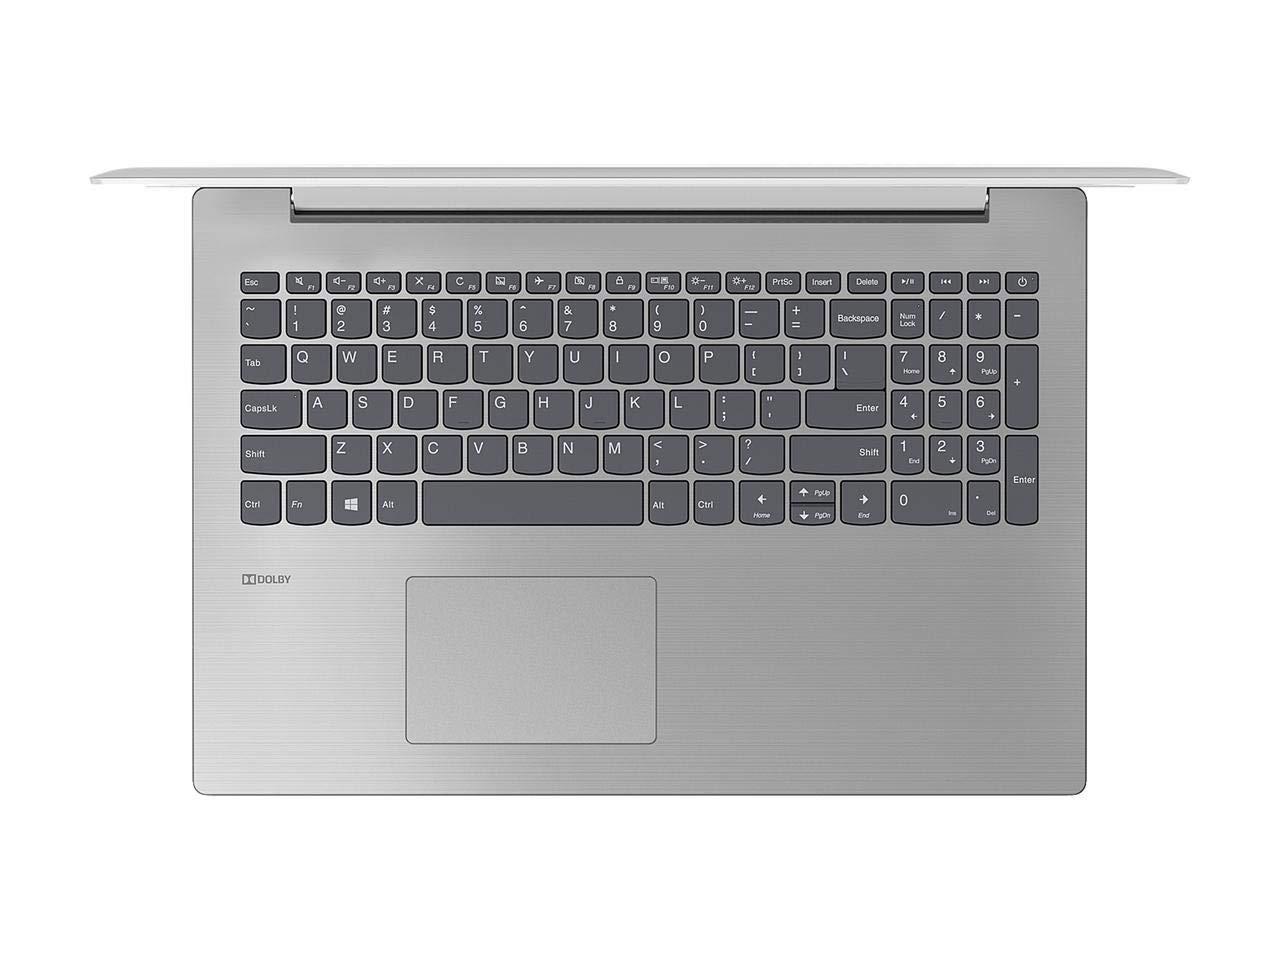 Amazon.com: Lenovo Laptop IdeaPad 330 81DE00L0US Intel Core i5 8th Gen 8250U 1.60 GHz, 8 GB,256 GB SSD 15.6